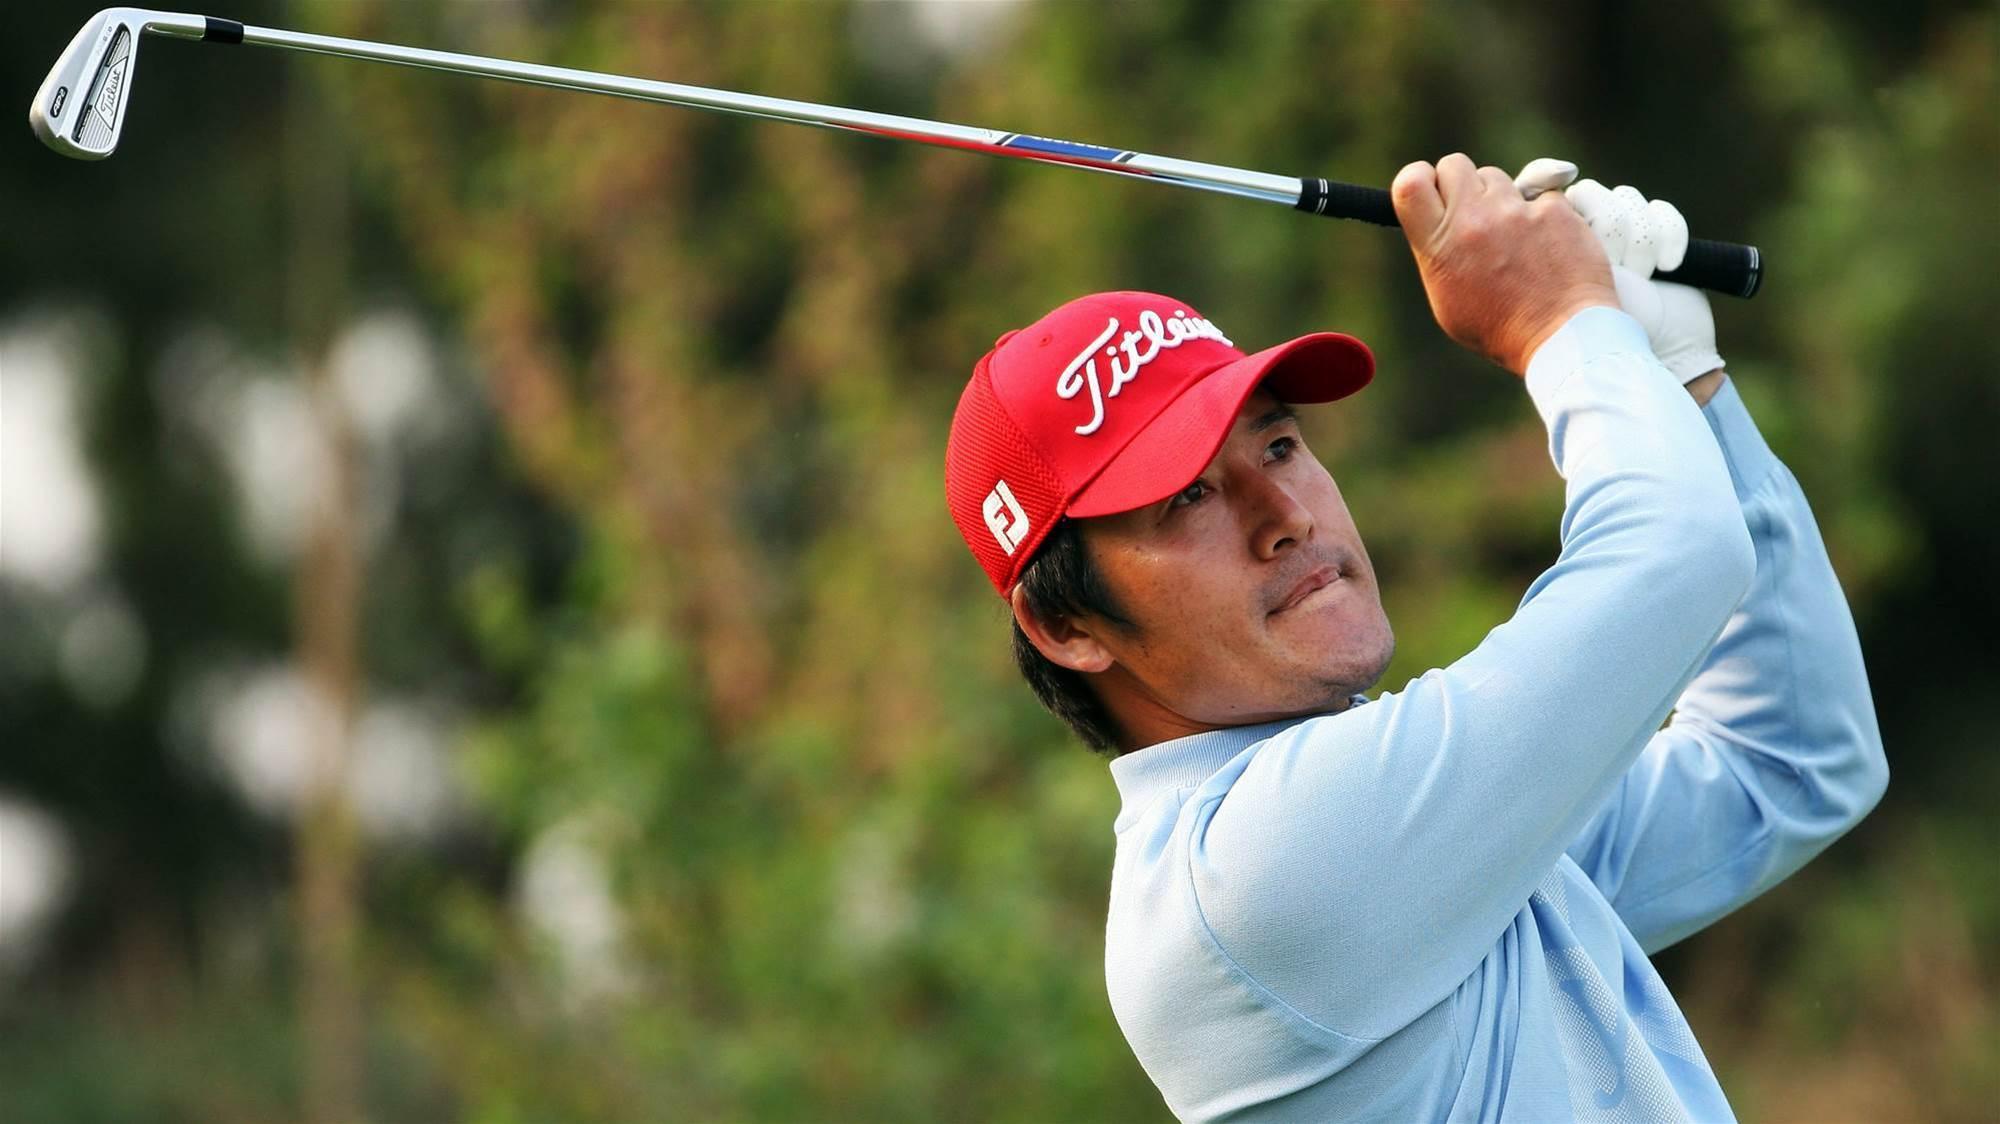 Internet sensation Choi set for PGA Tour debut